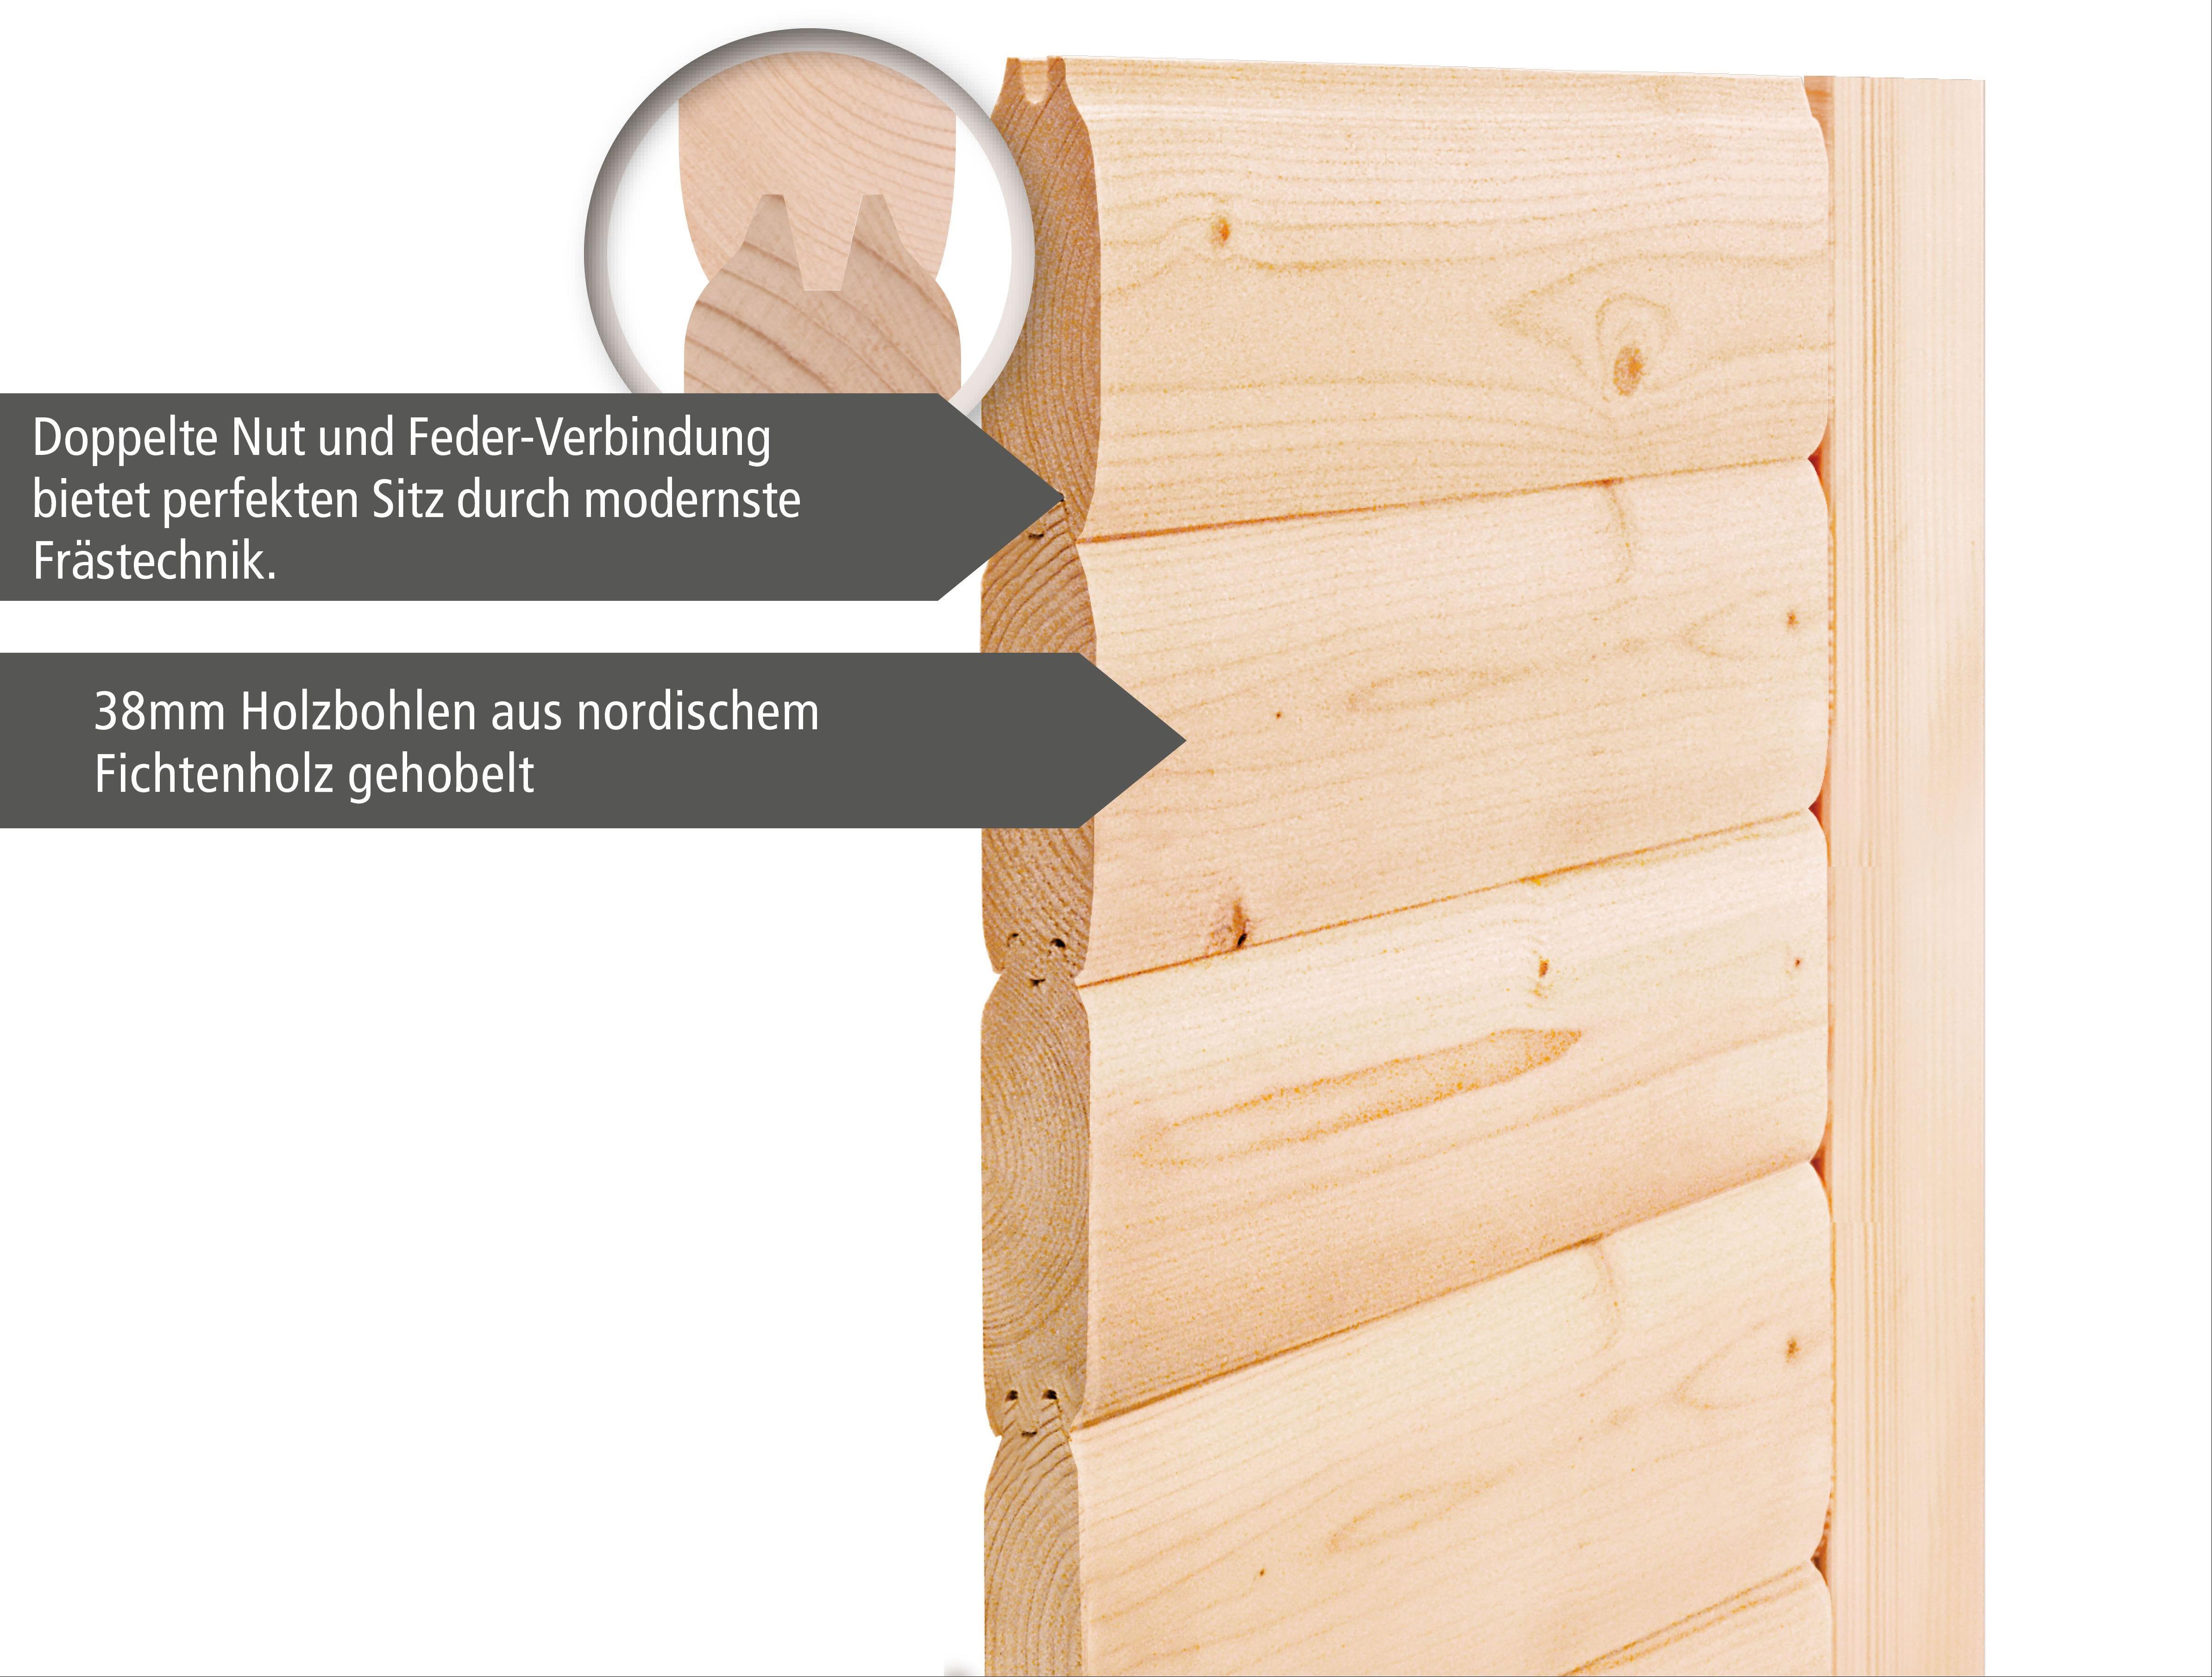 WoodFeeling Sauna Nina 38mm Bio Saunaofen 9kW ext. Kranz Klarglas Tür Bild 5